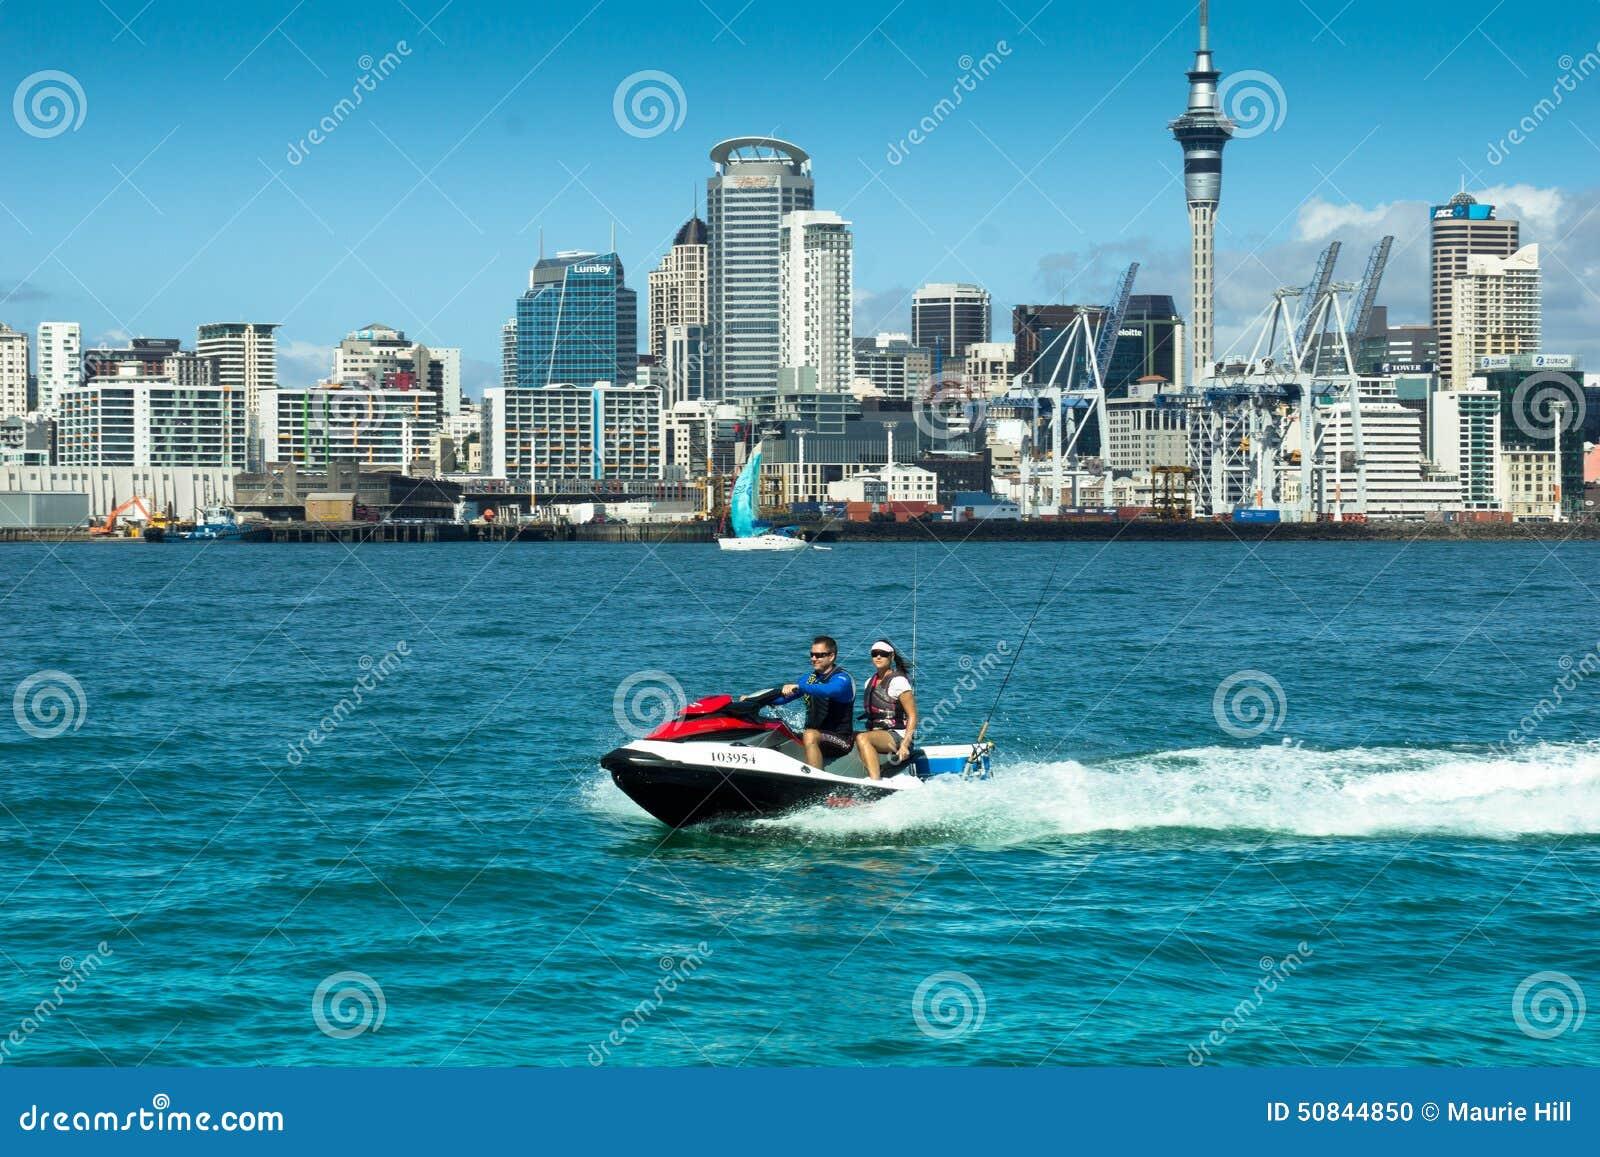 Auckland Skyline & PWC - Jetski Editorial Image - Image of